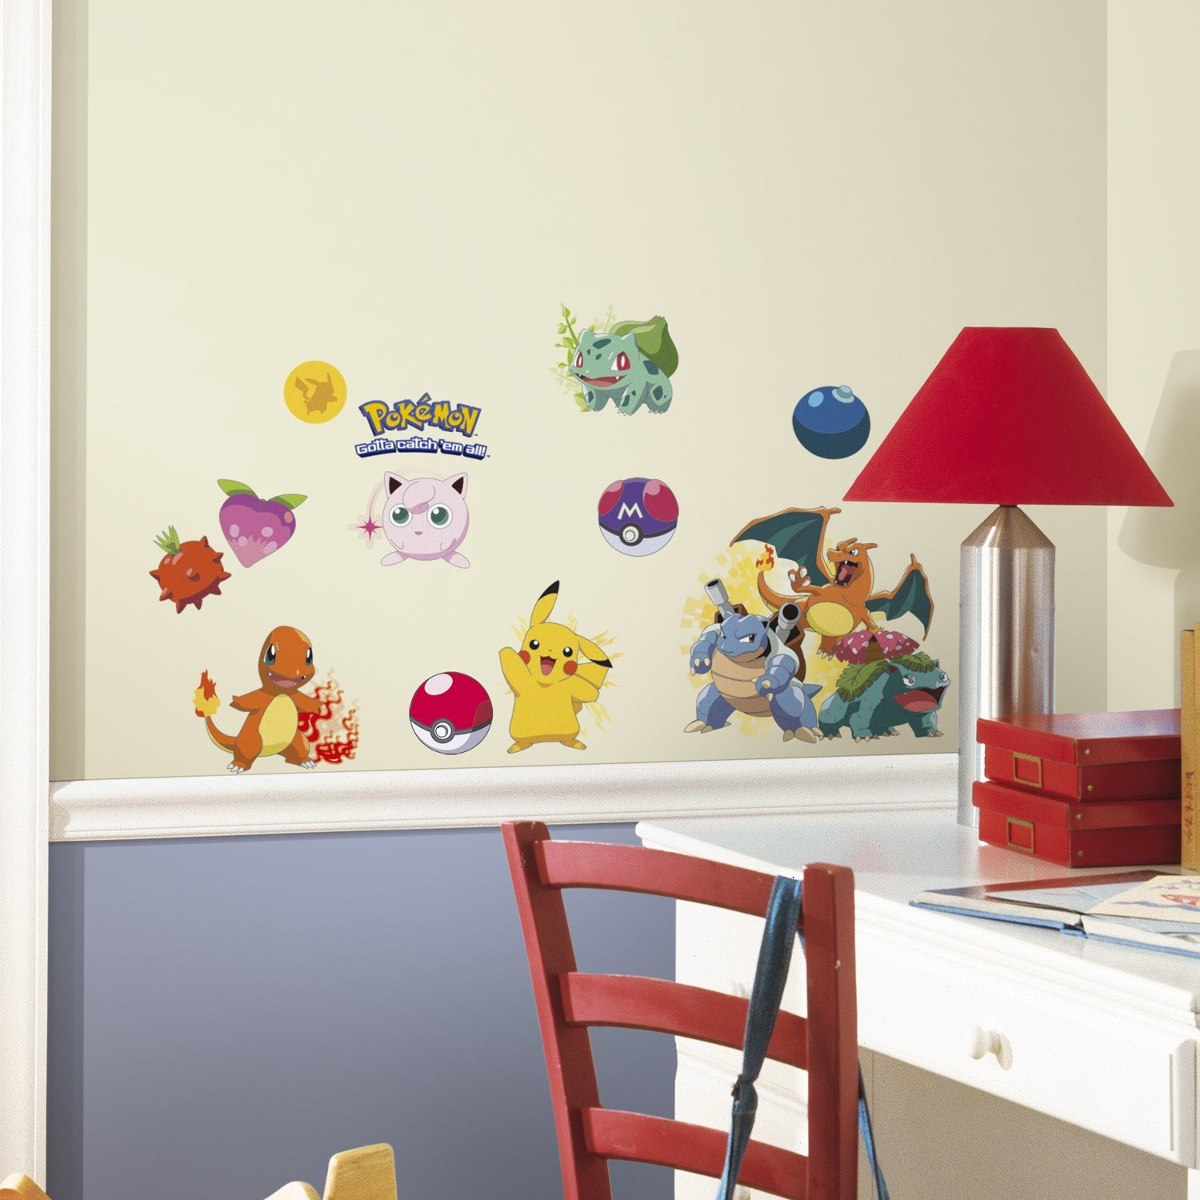 24 Calcomanias Pokemon Para Decorar Pared Blakhelmet Nsp  # Muebles Pokemon Mercadolibre